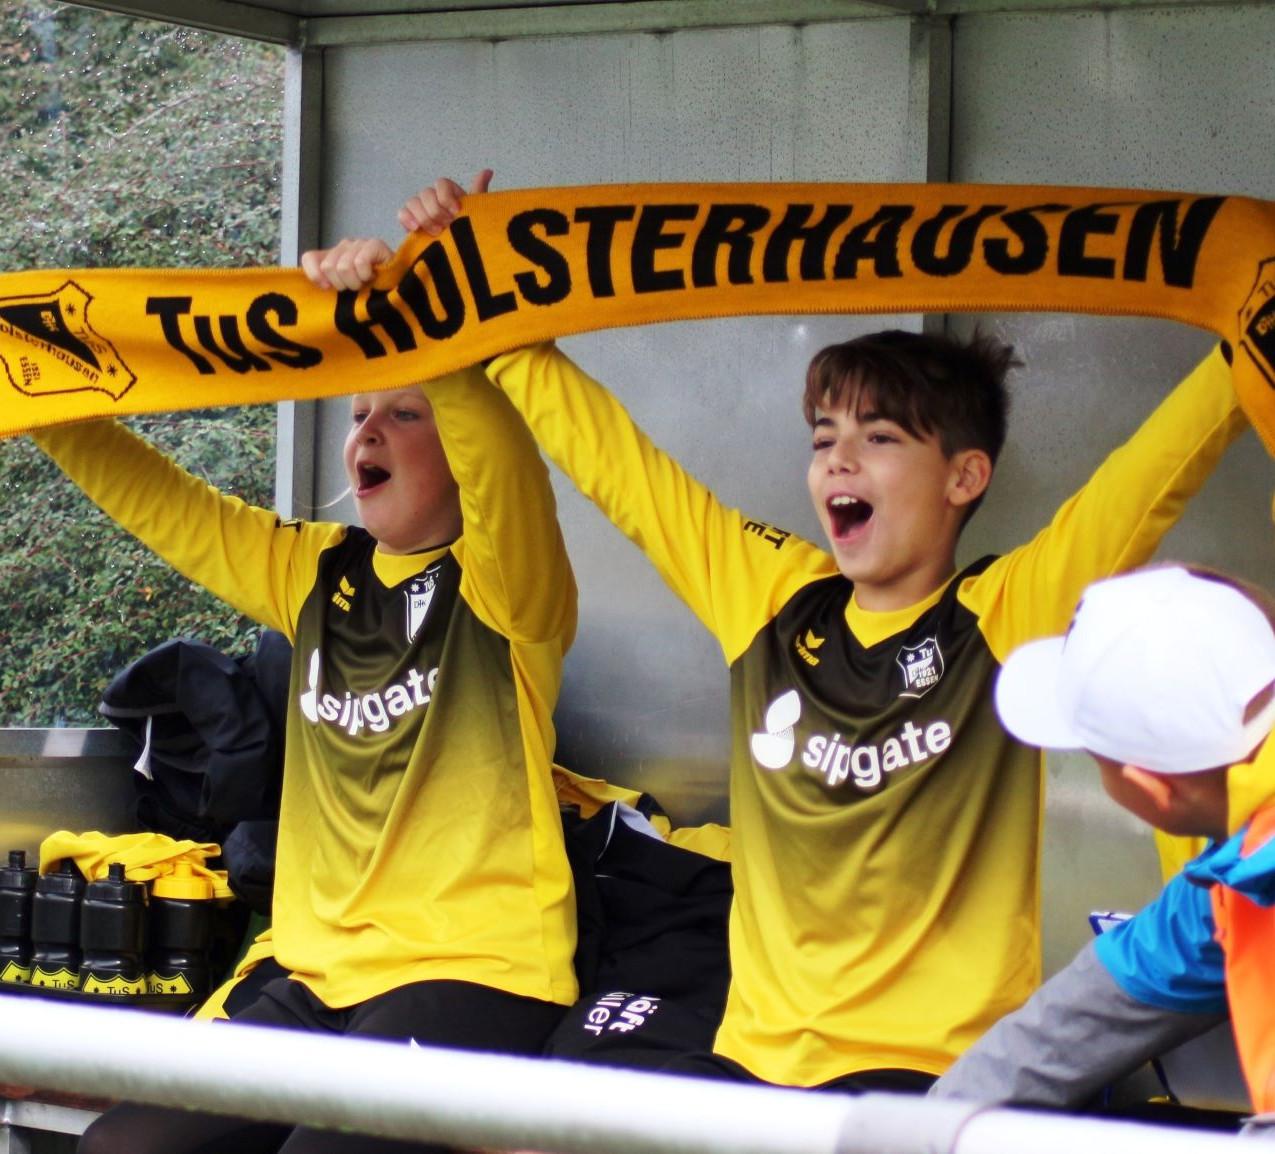 TuS Holsterhausen D3-Jugend